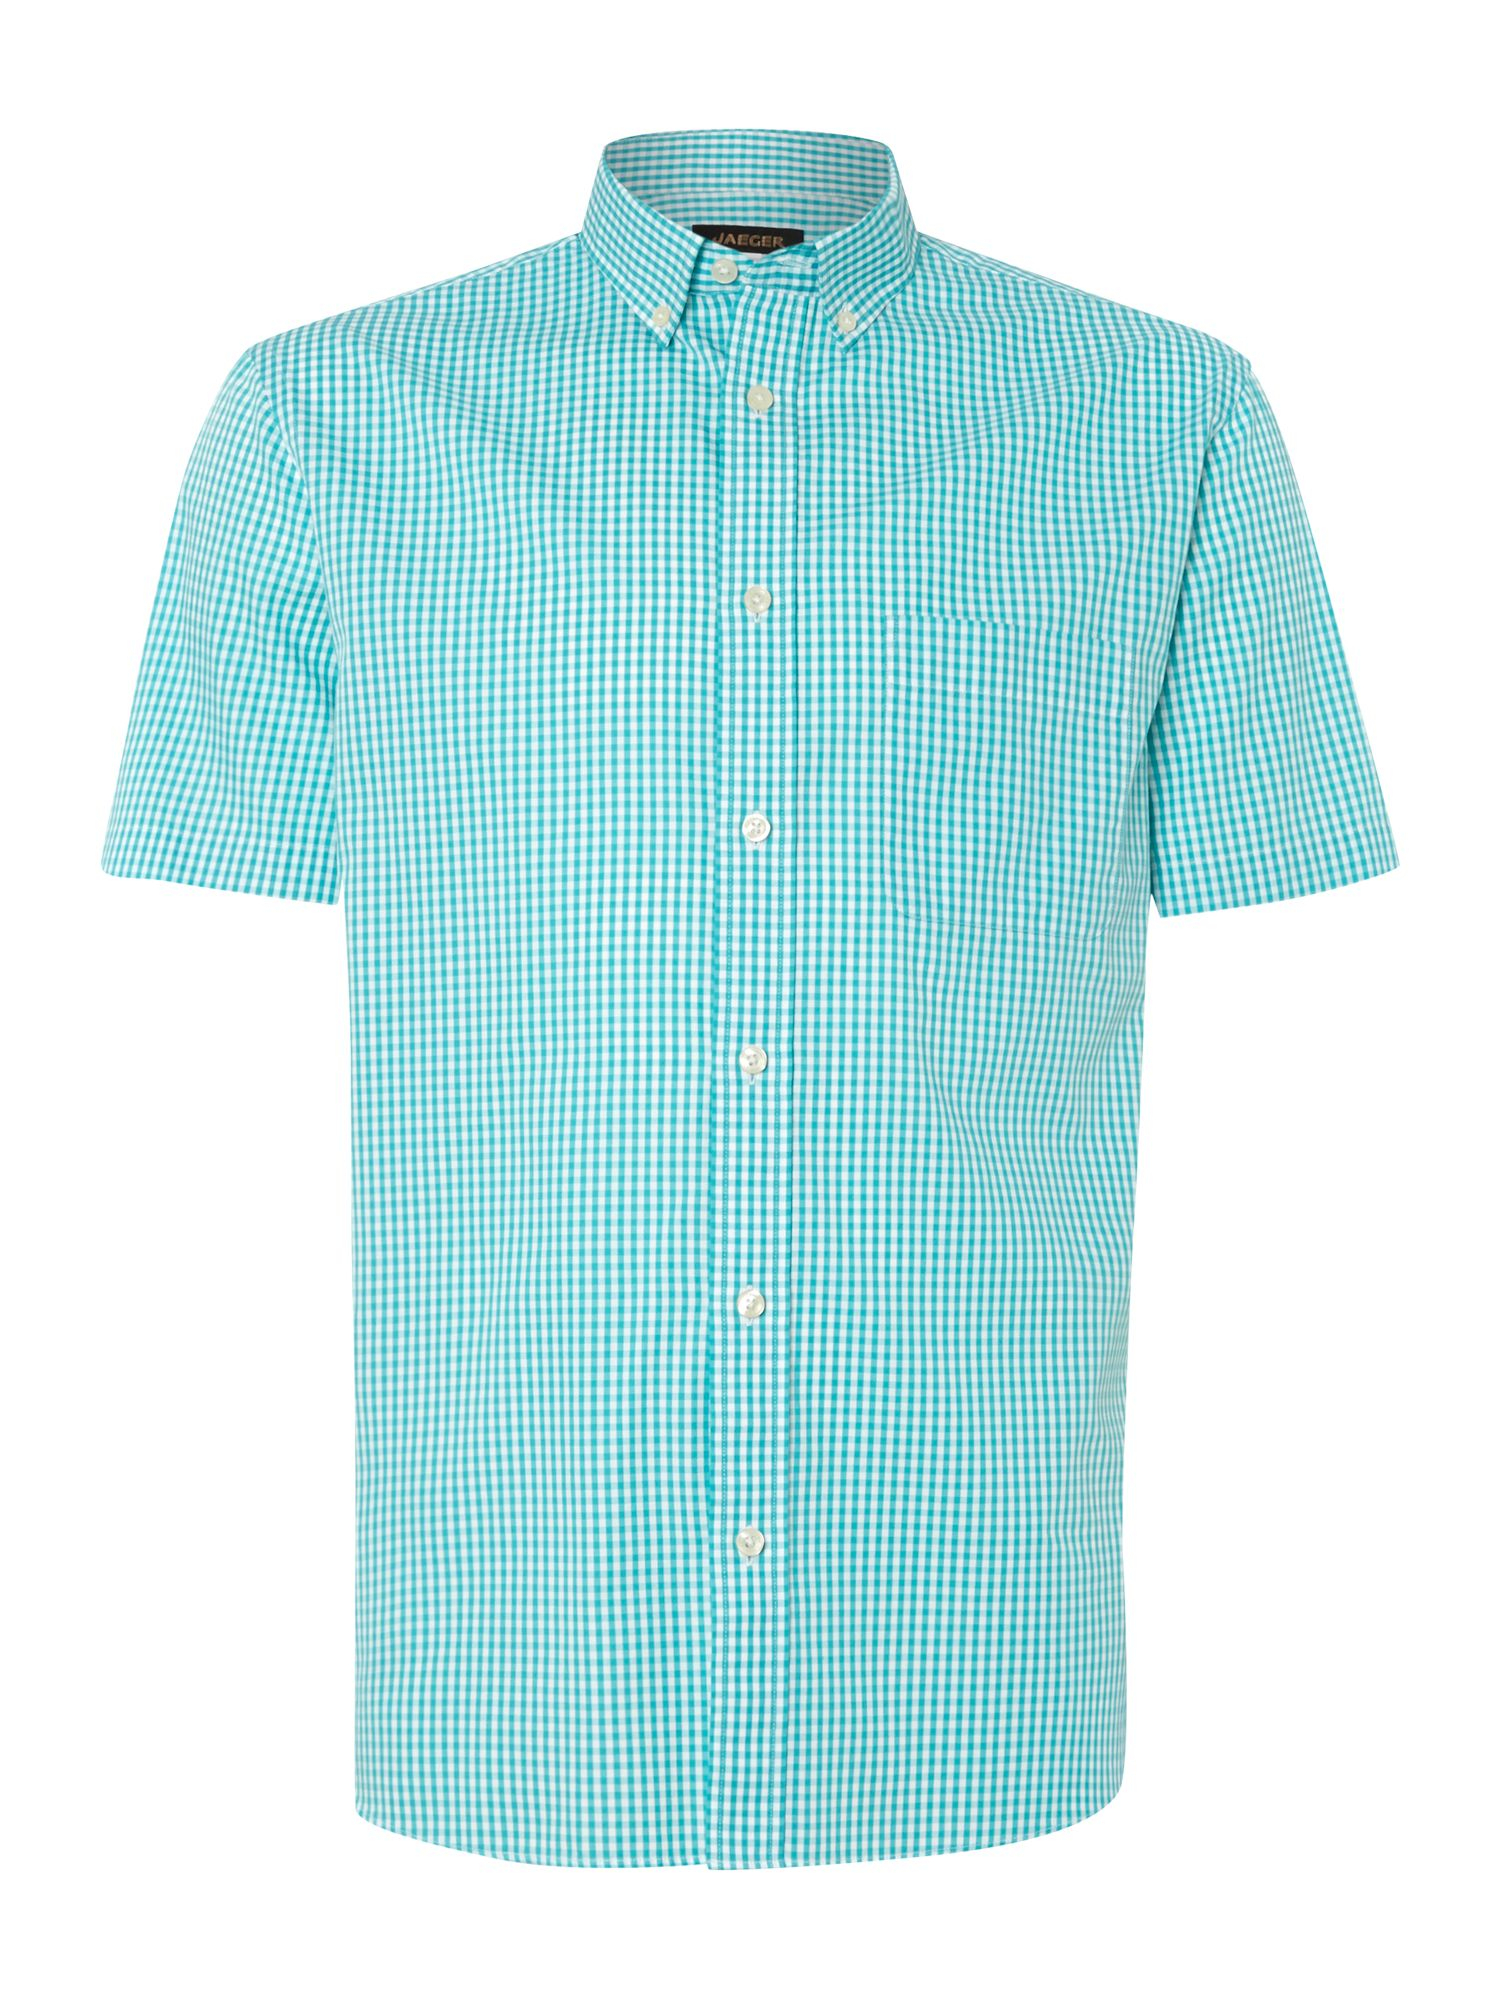 Jaeger Gingham Short Sleeve Classic Collar Shirt In Green